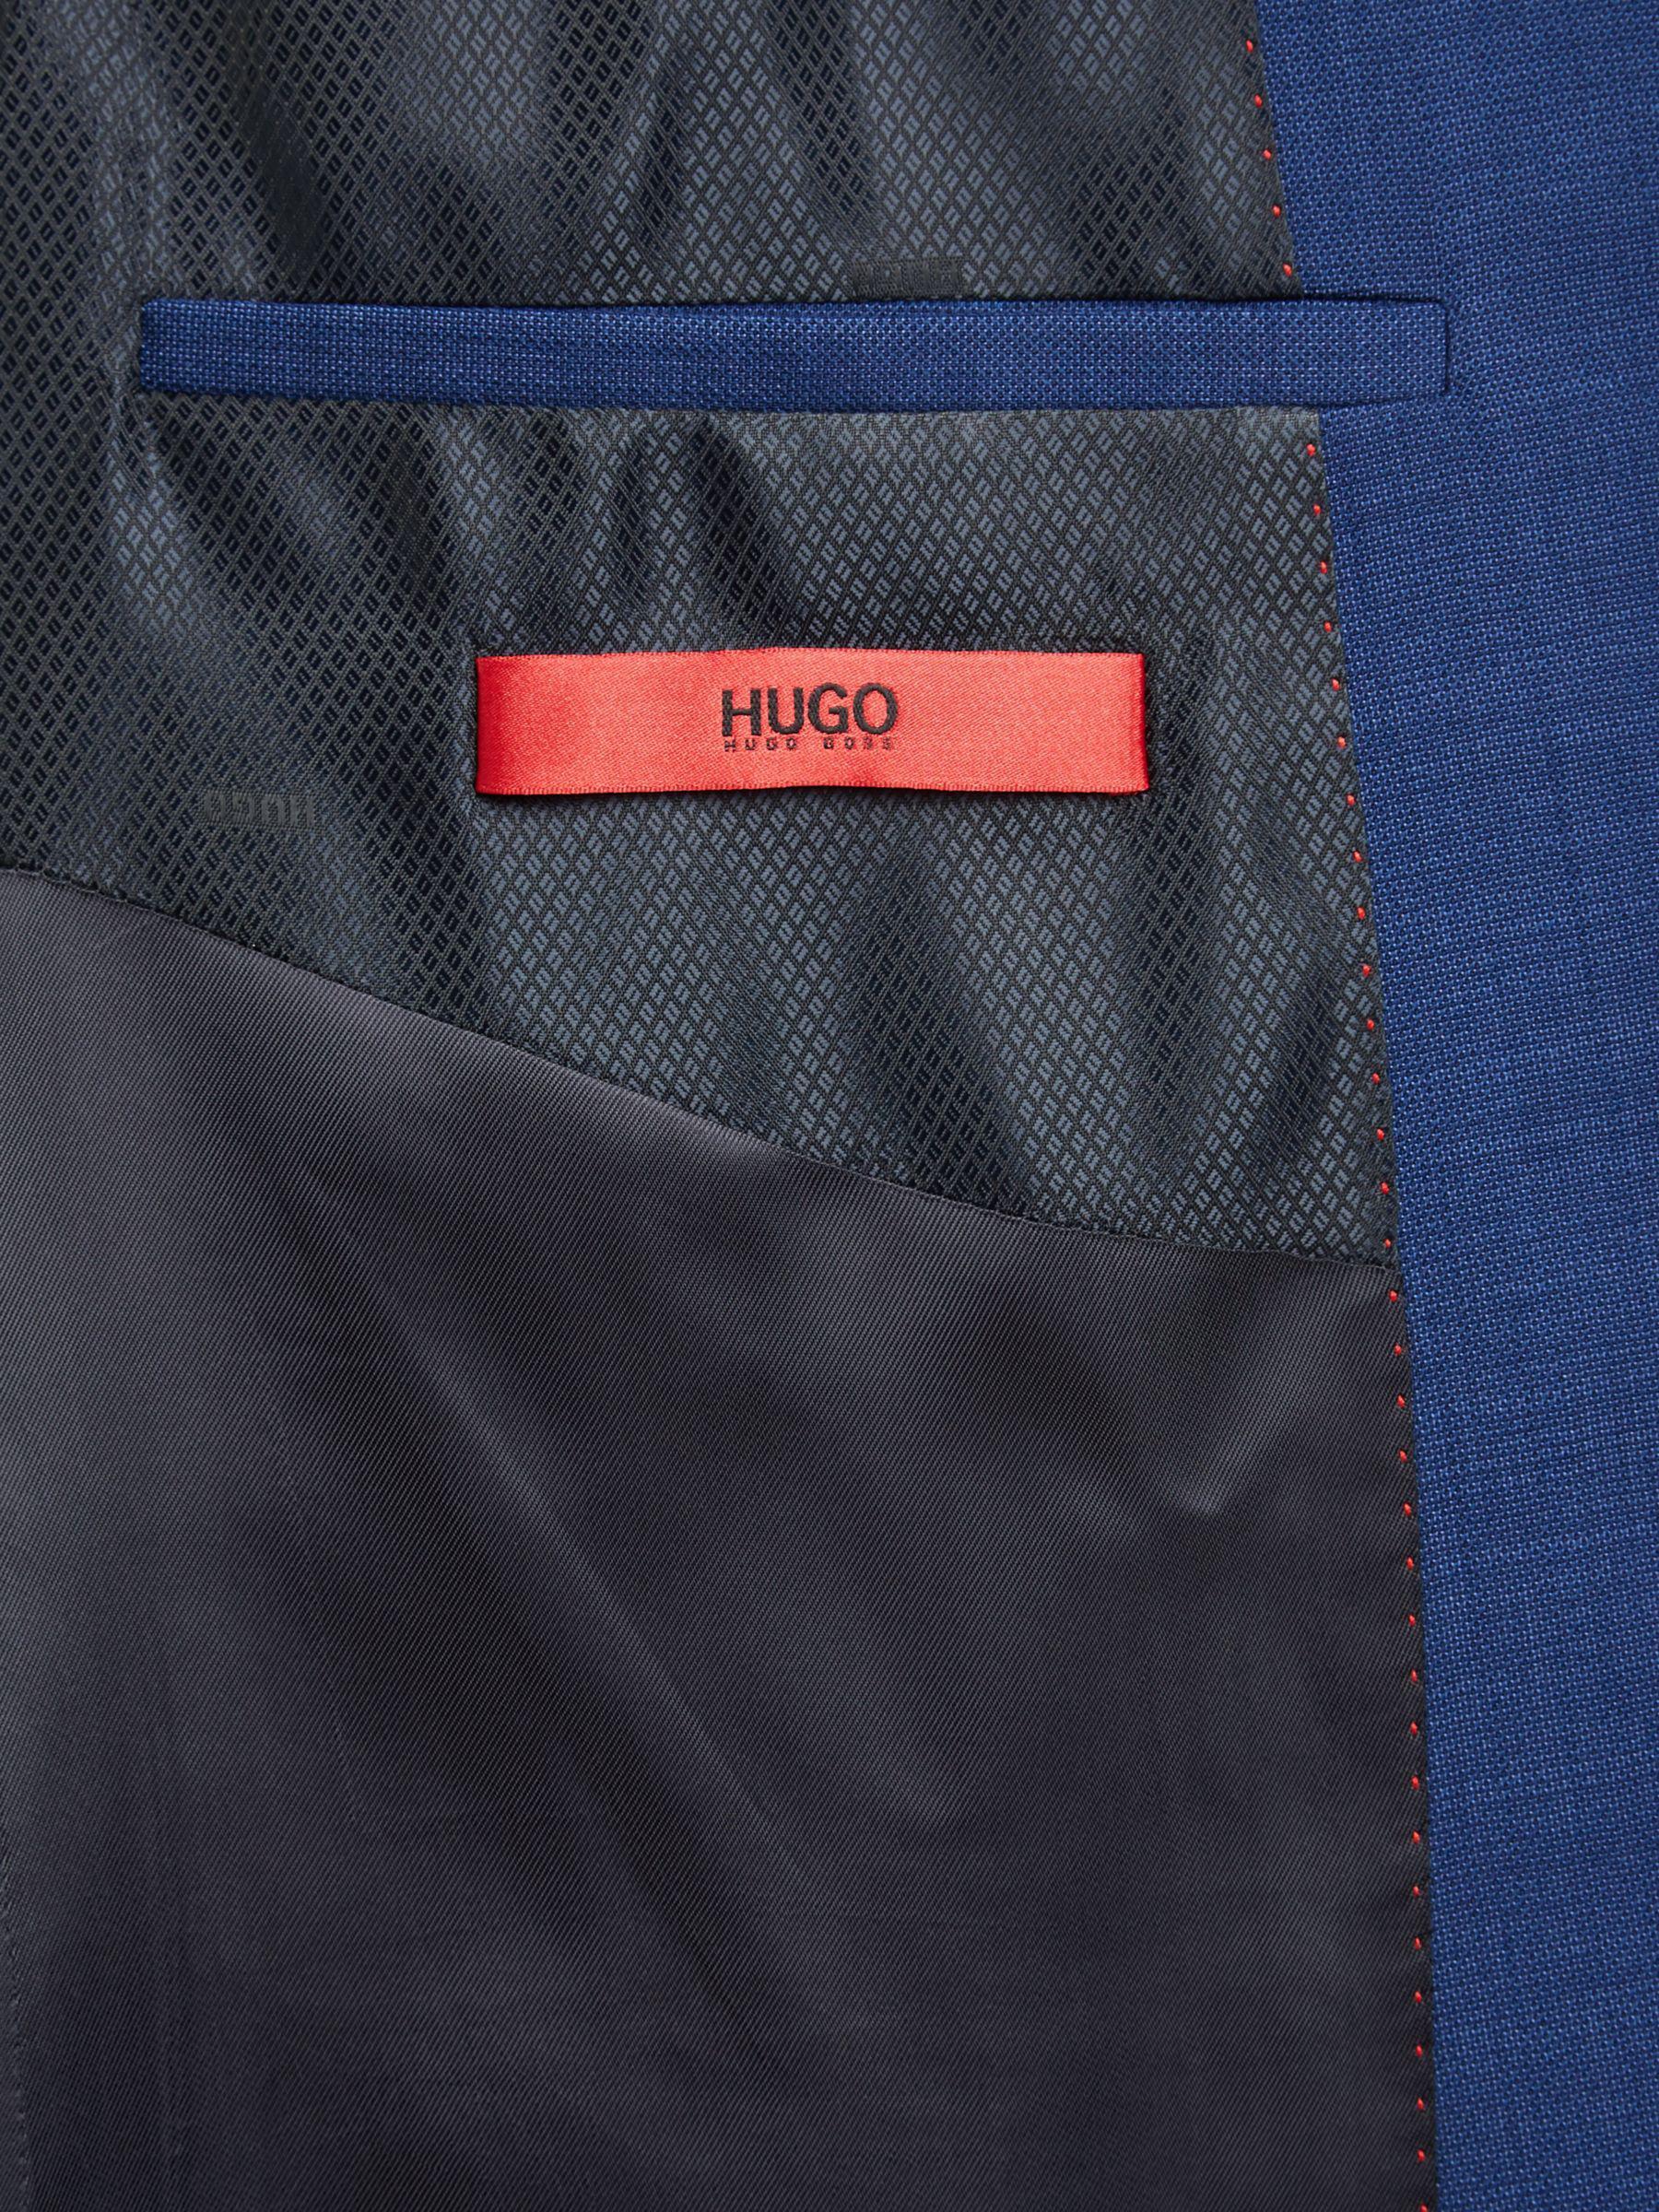 593c811e5 BOSS Hugo By Henry/griffin Virgin Wool Slim Fit Suit Jacket in Blue ...